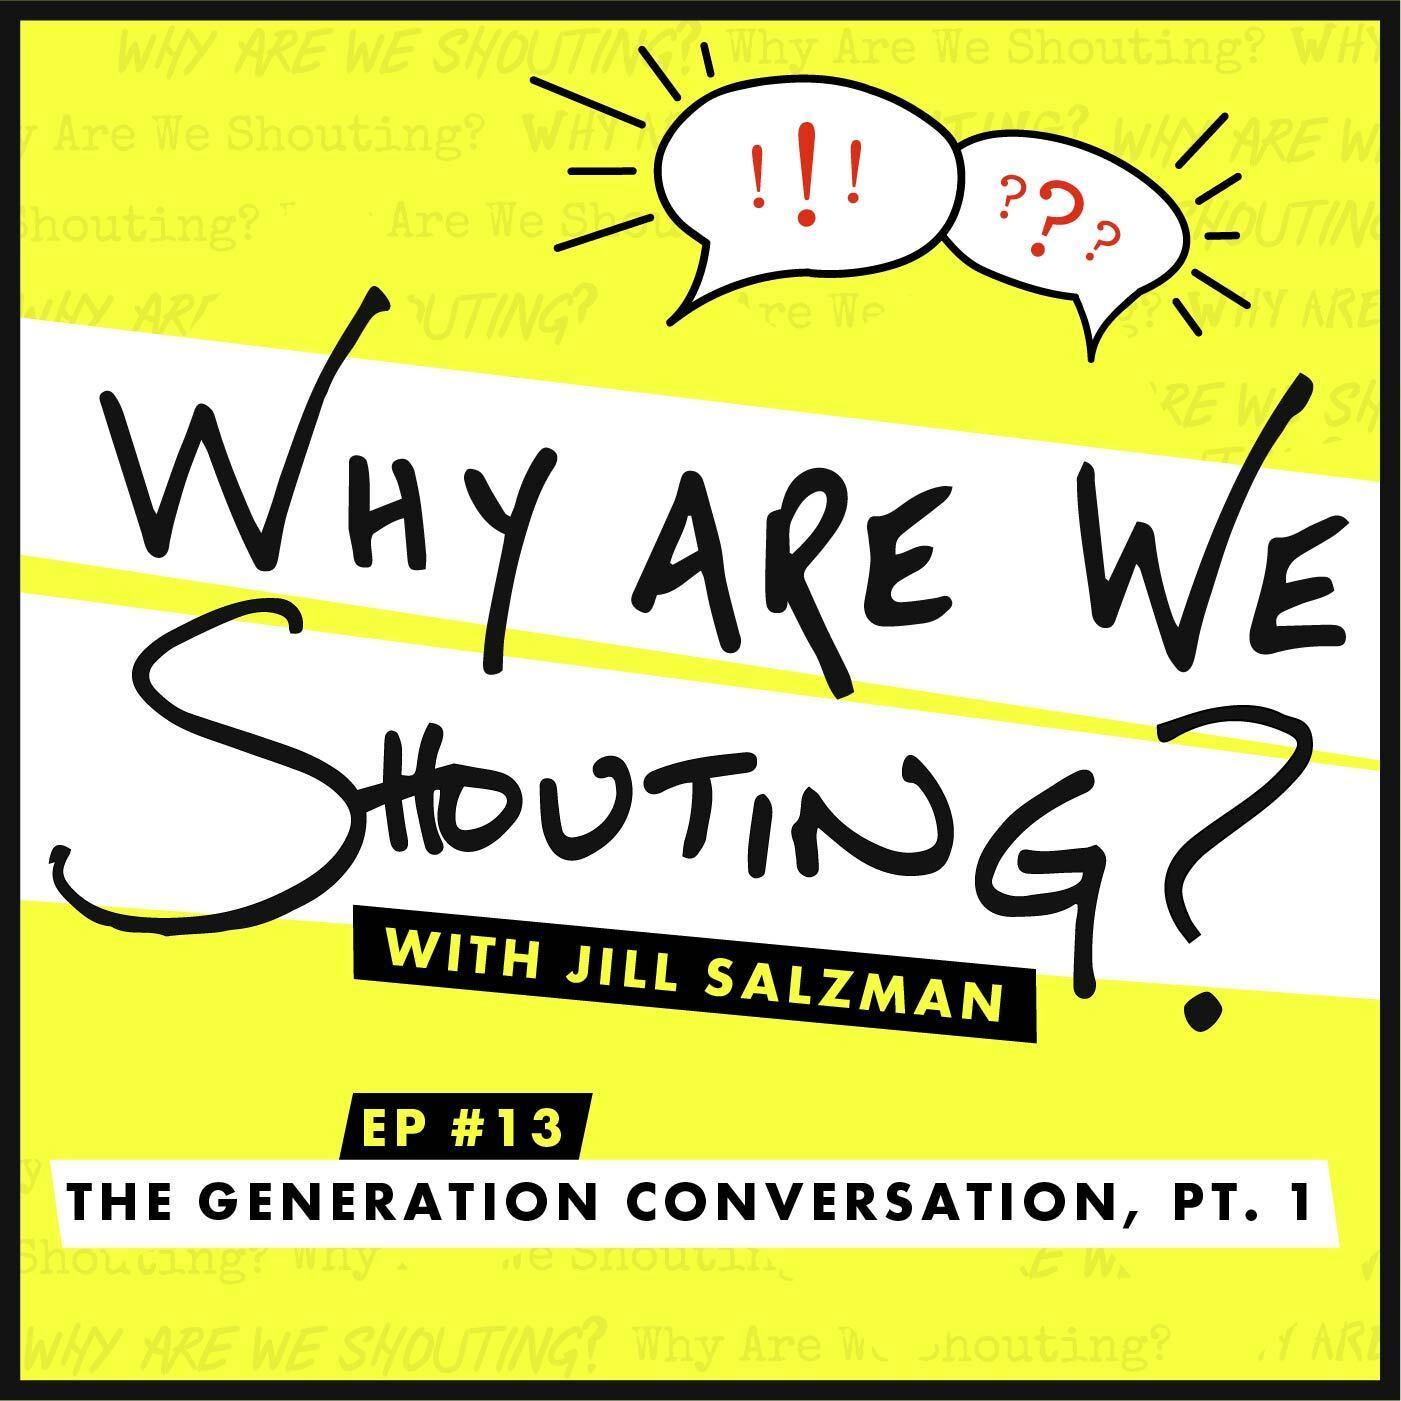 The Generation Conversation, Pt. 1